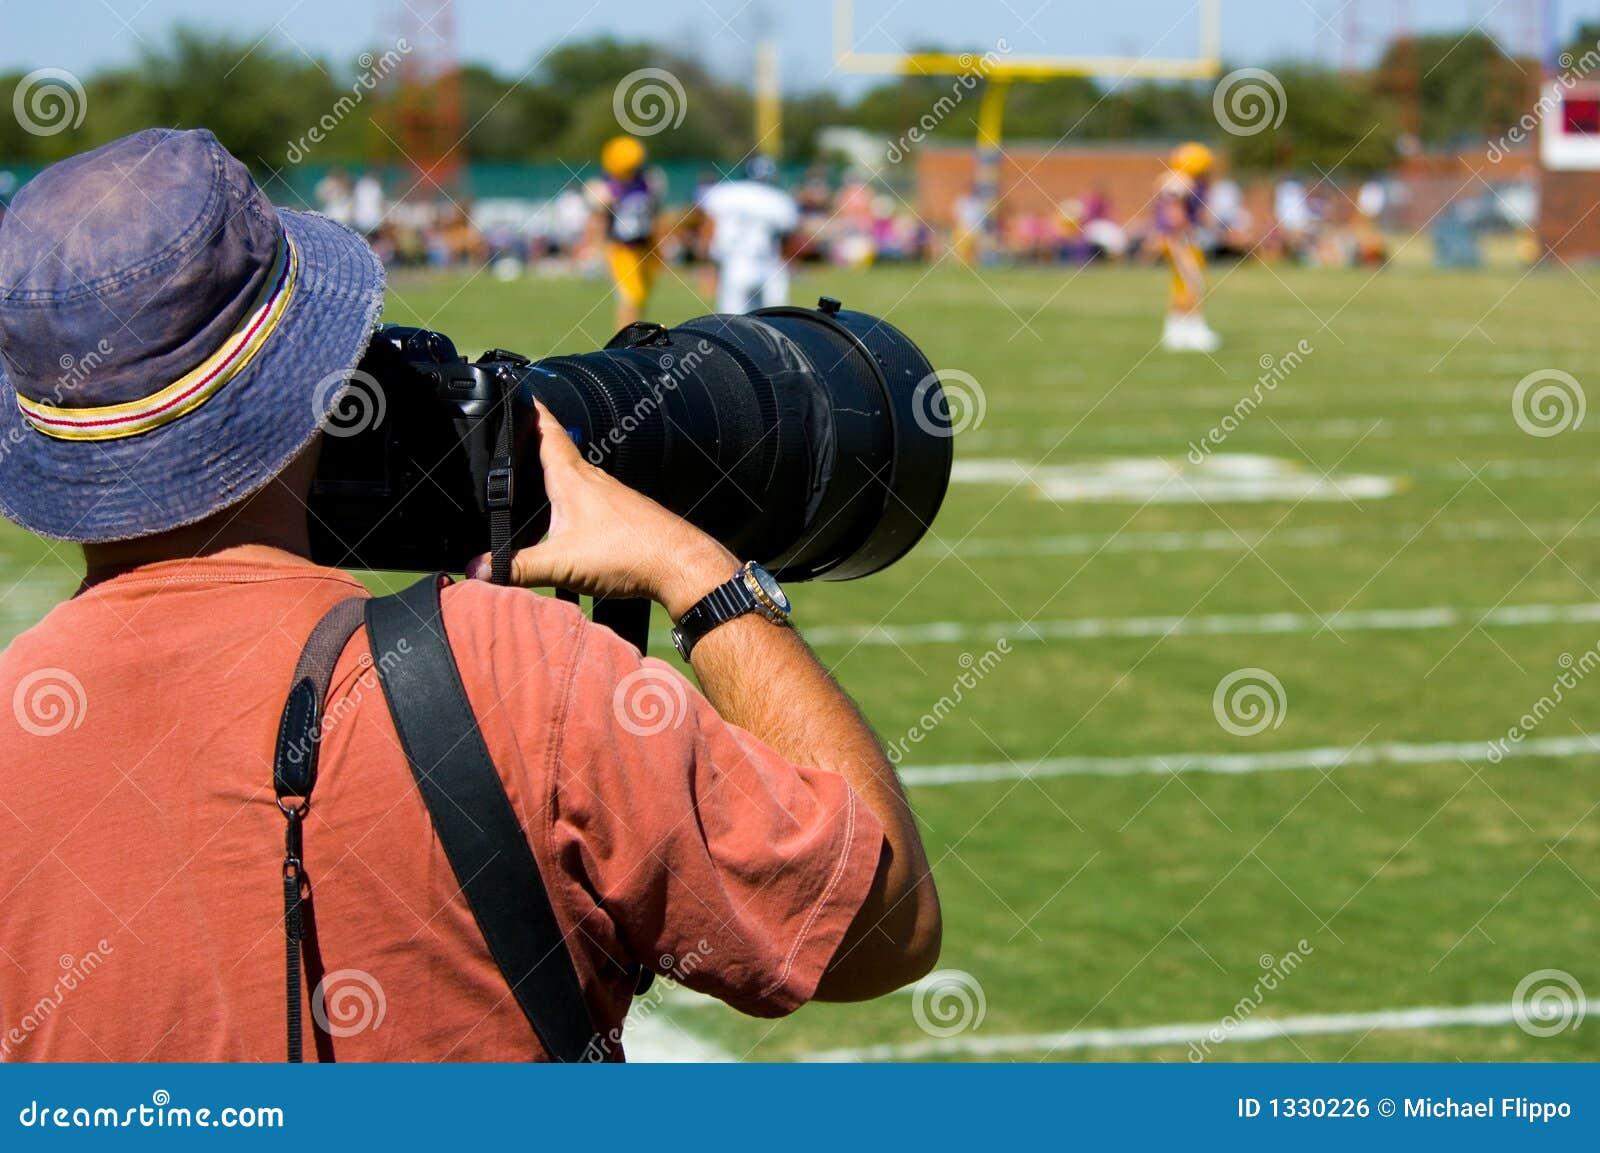 professional sports photogapher american football